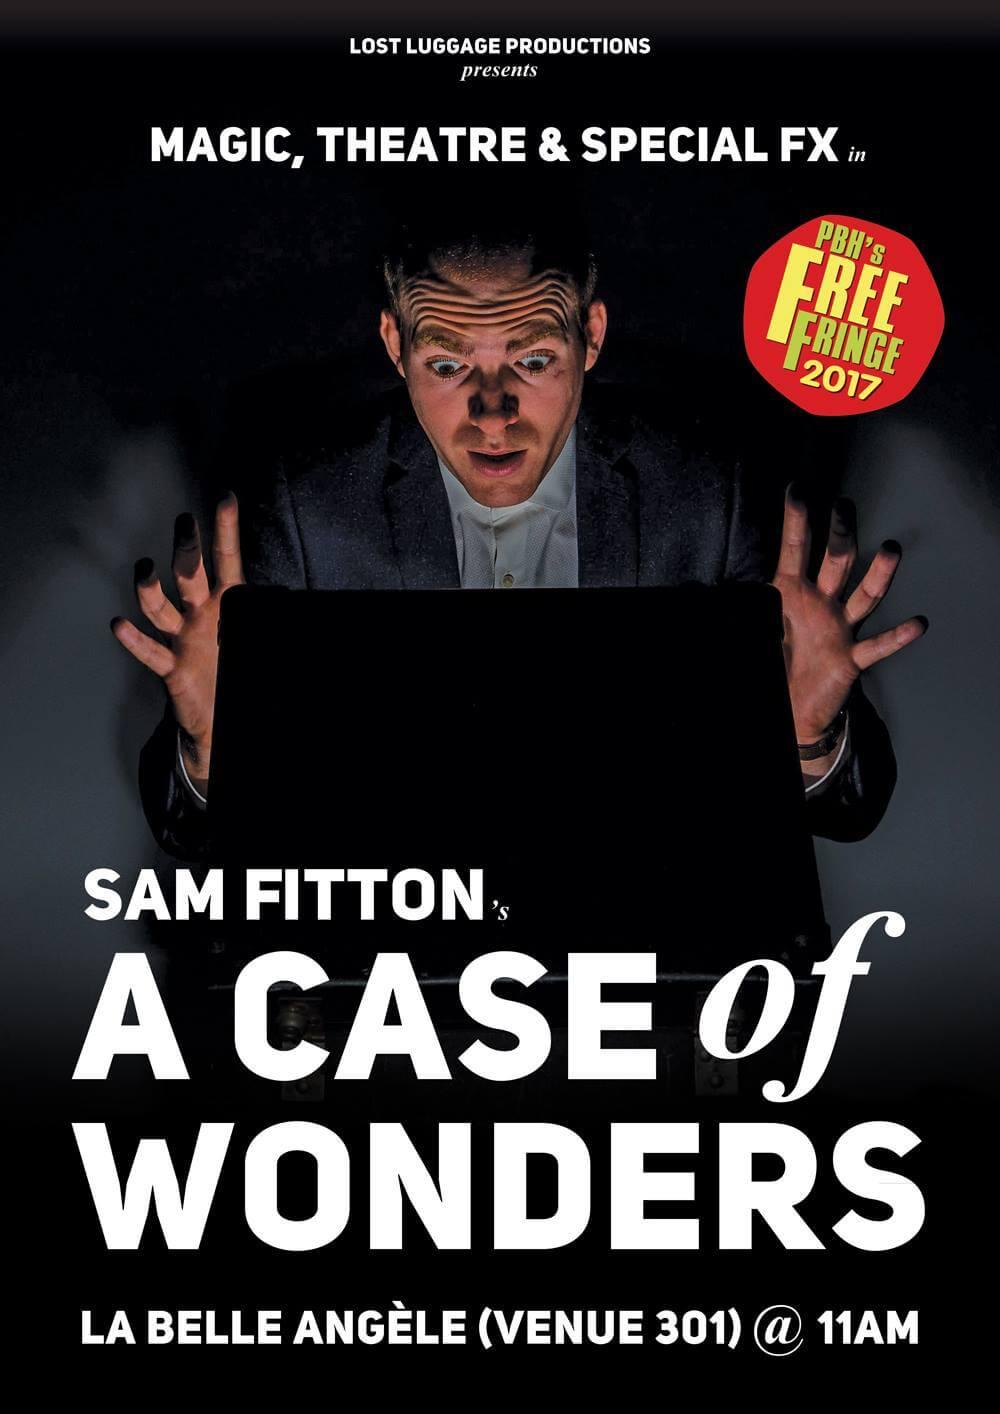 Sam Fitton A Case of Wonders Edinburgh Fringe magic poster